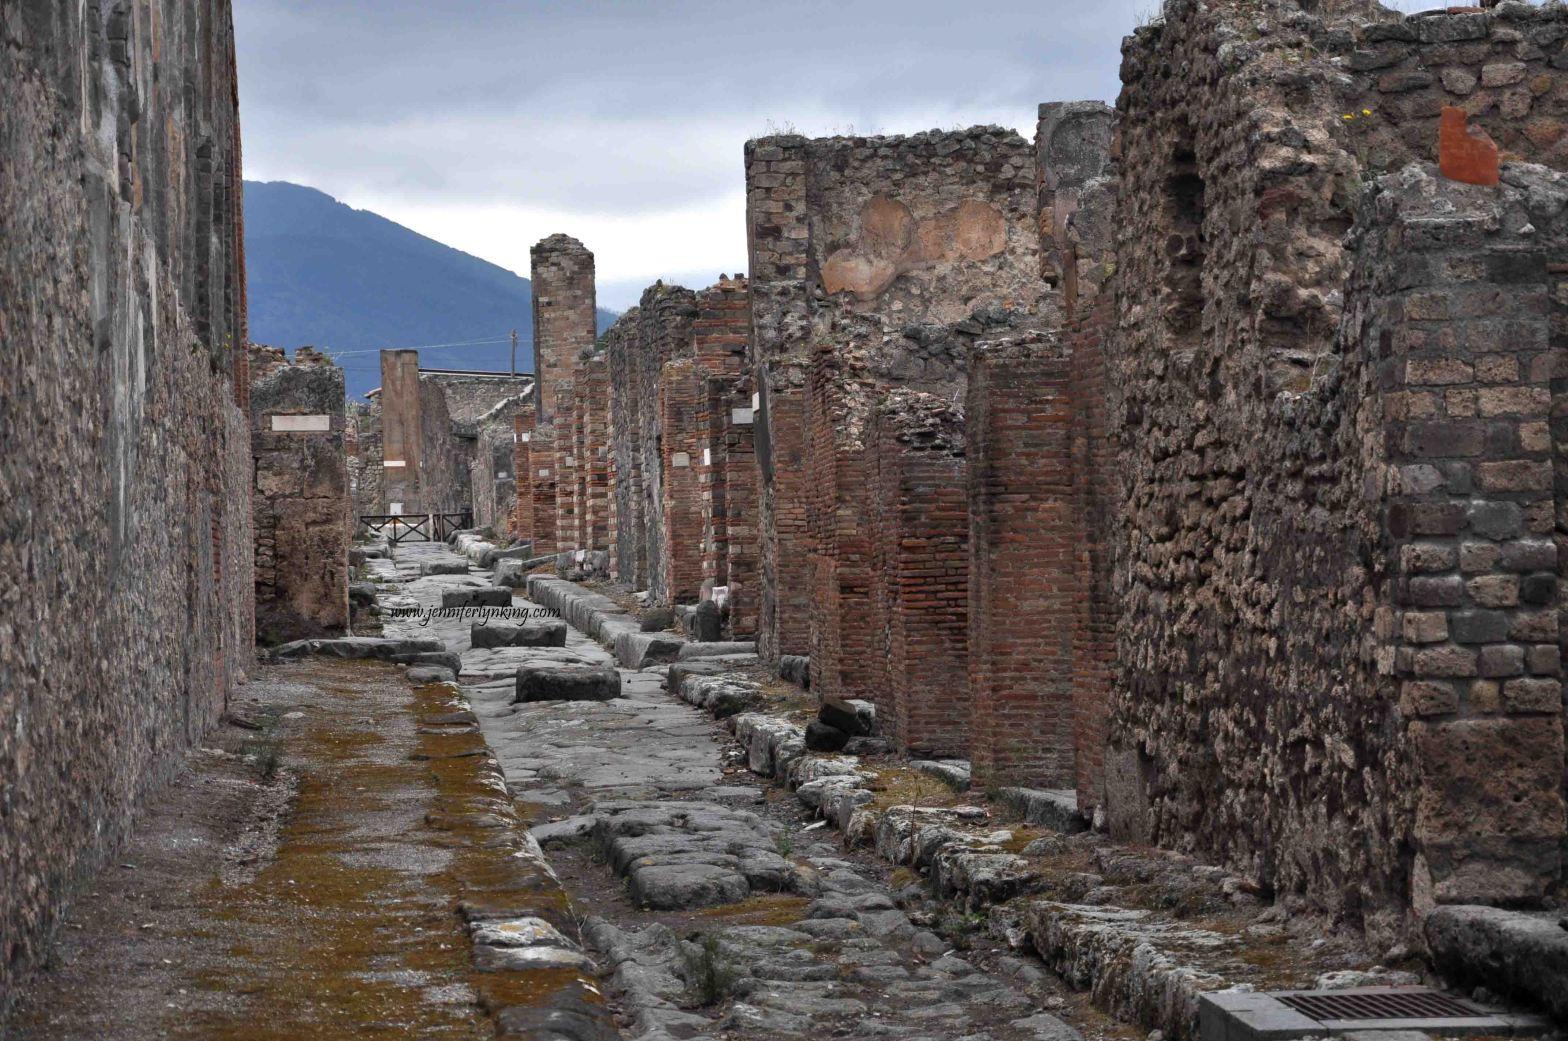 A Street leading toward Mt Vesuvius, Pompeii, Italy